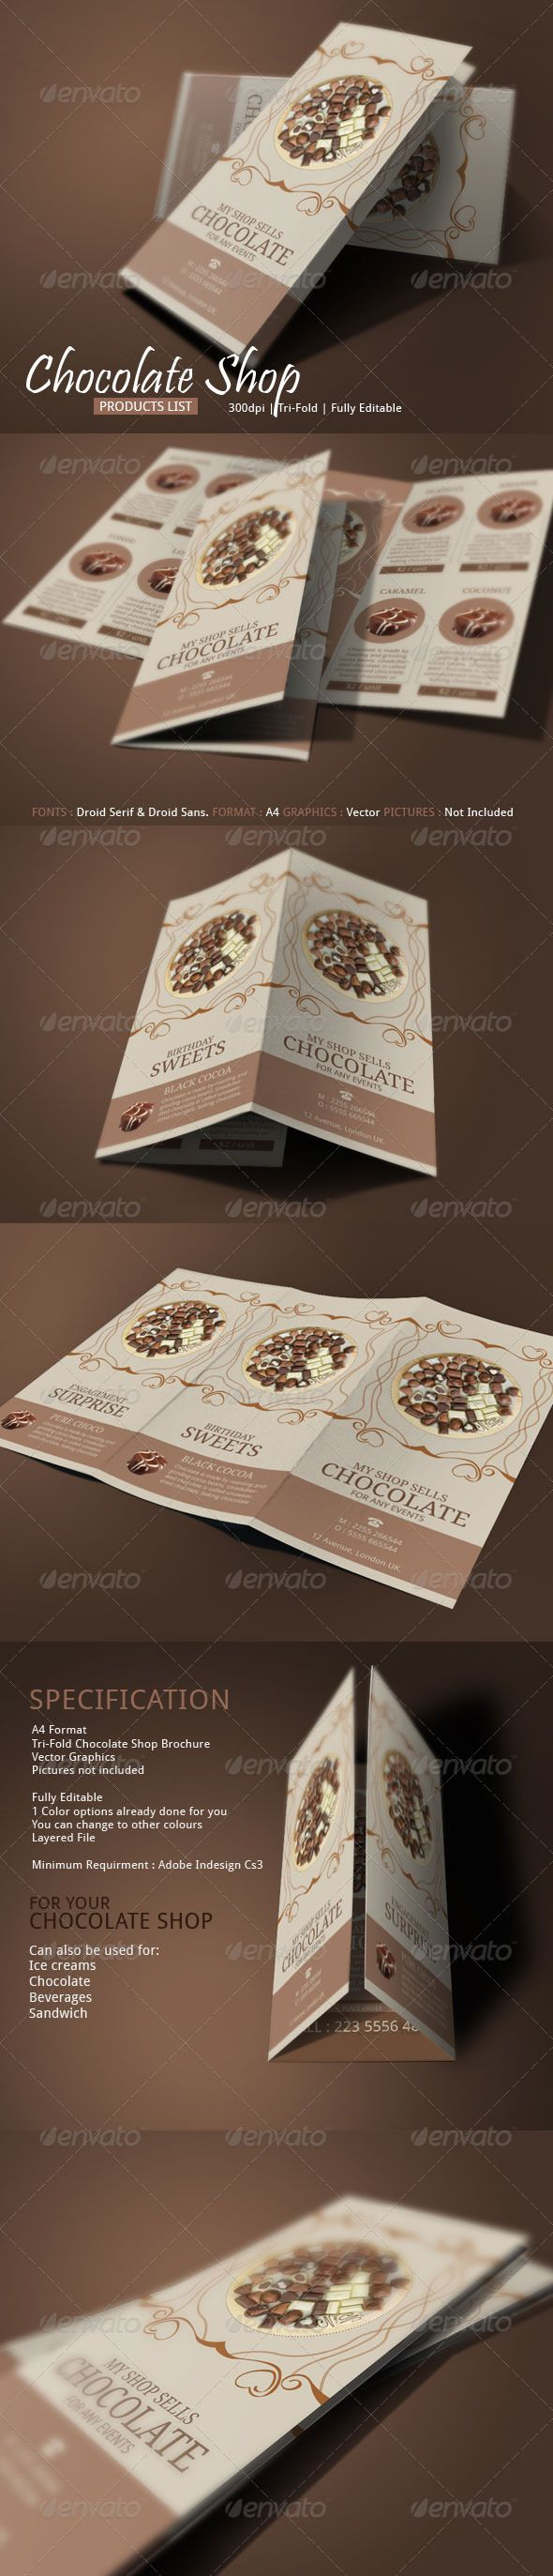 Swiss Chocolate Brochure Template #design Download: http://graphicriver.net/item/swiss-chocolate-brochure-template/7329591?ref=ksioks